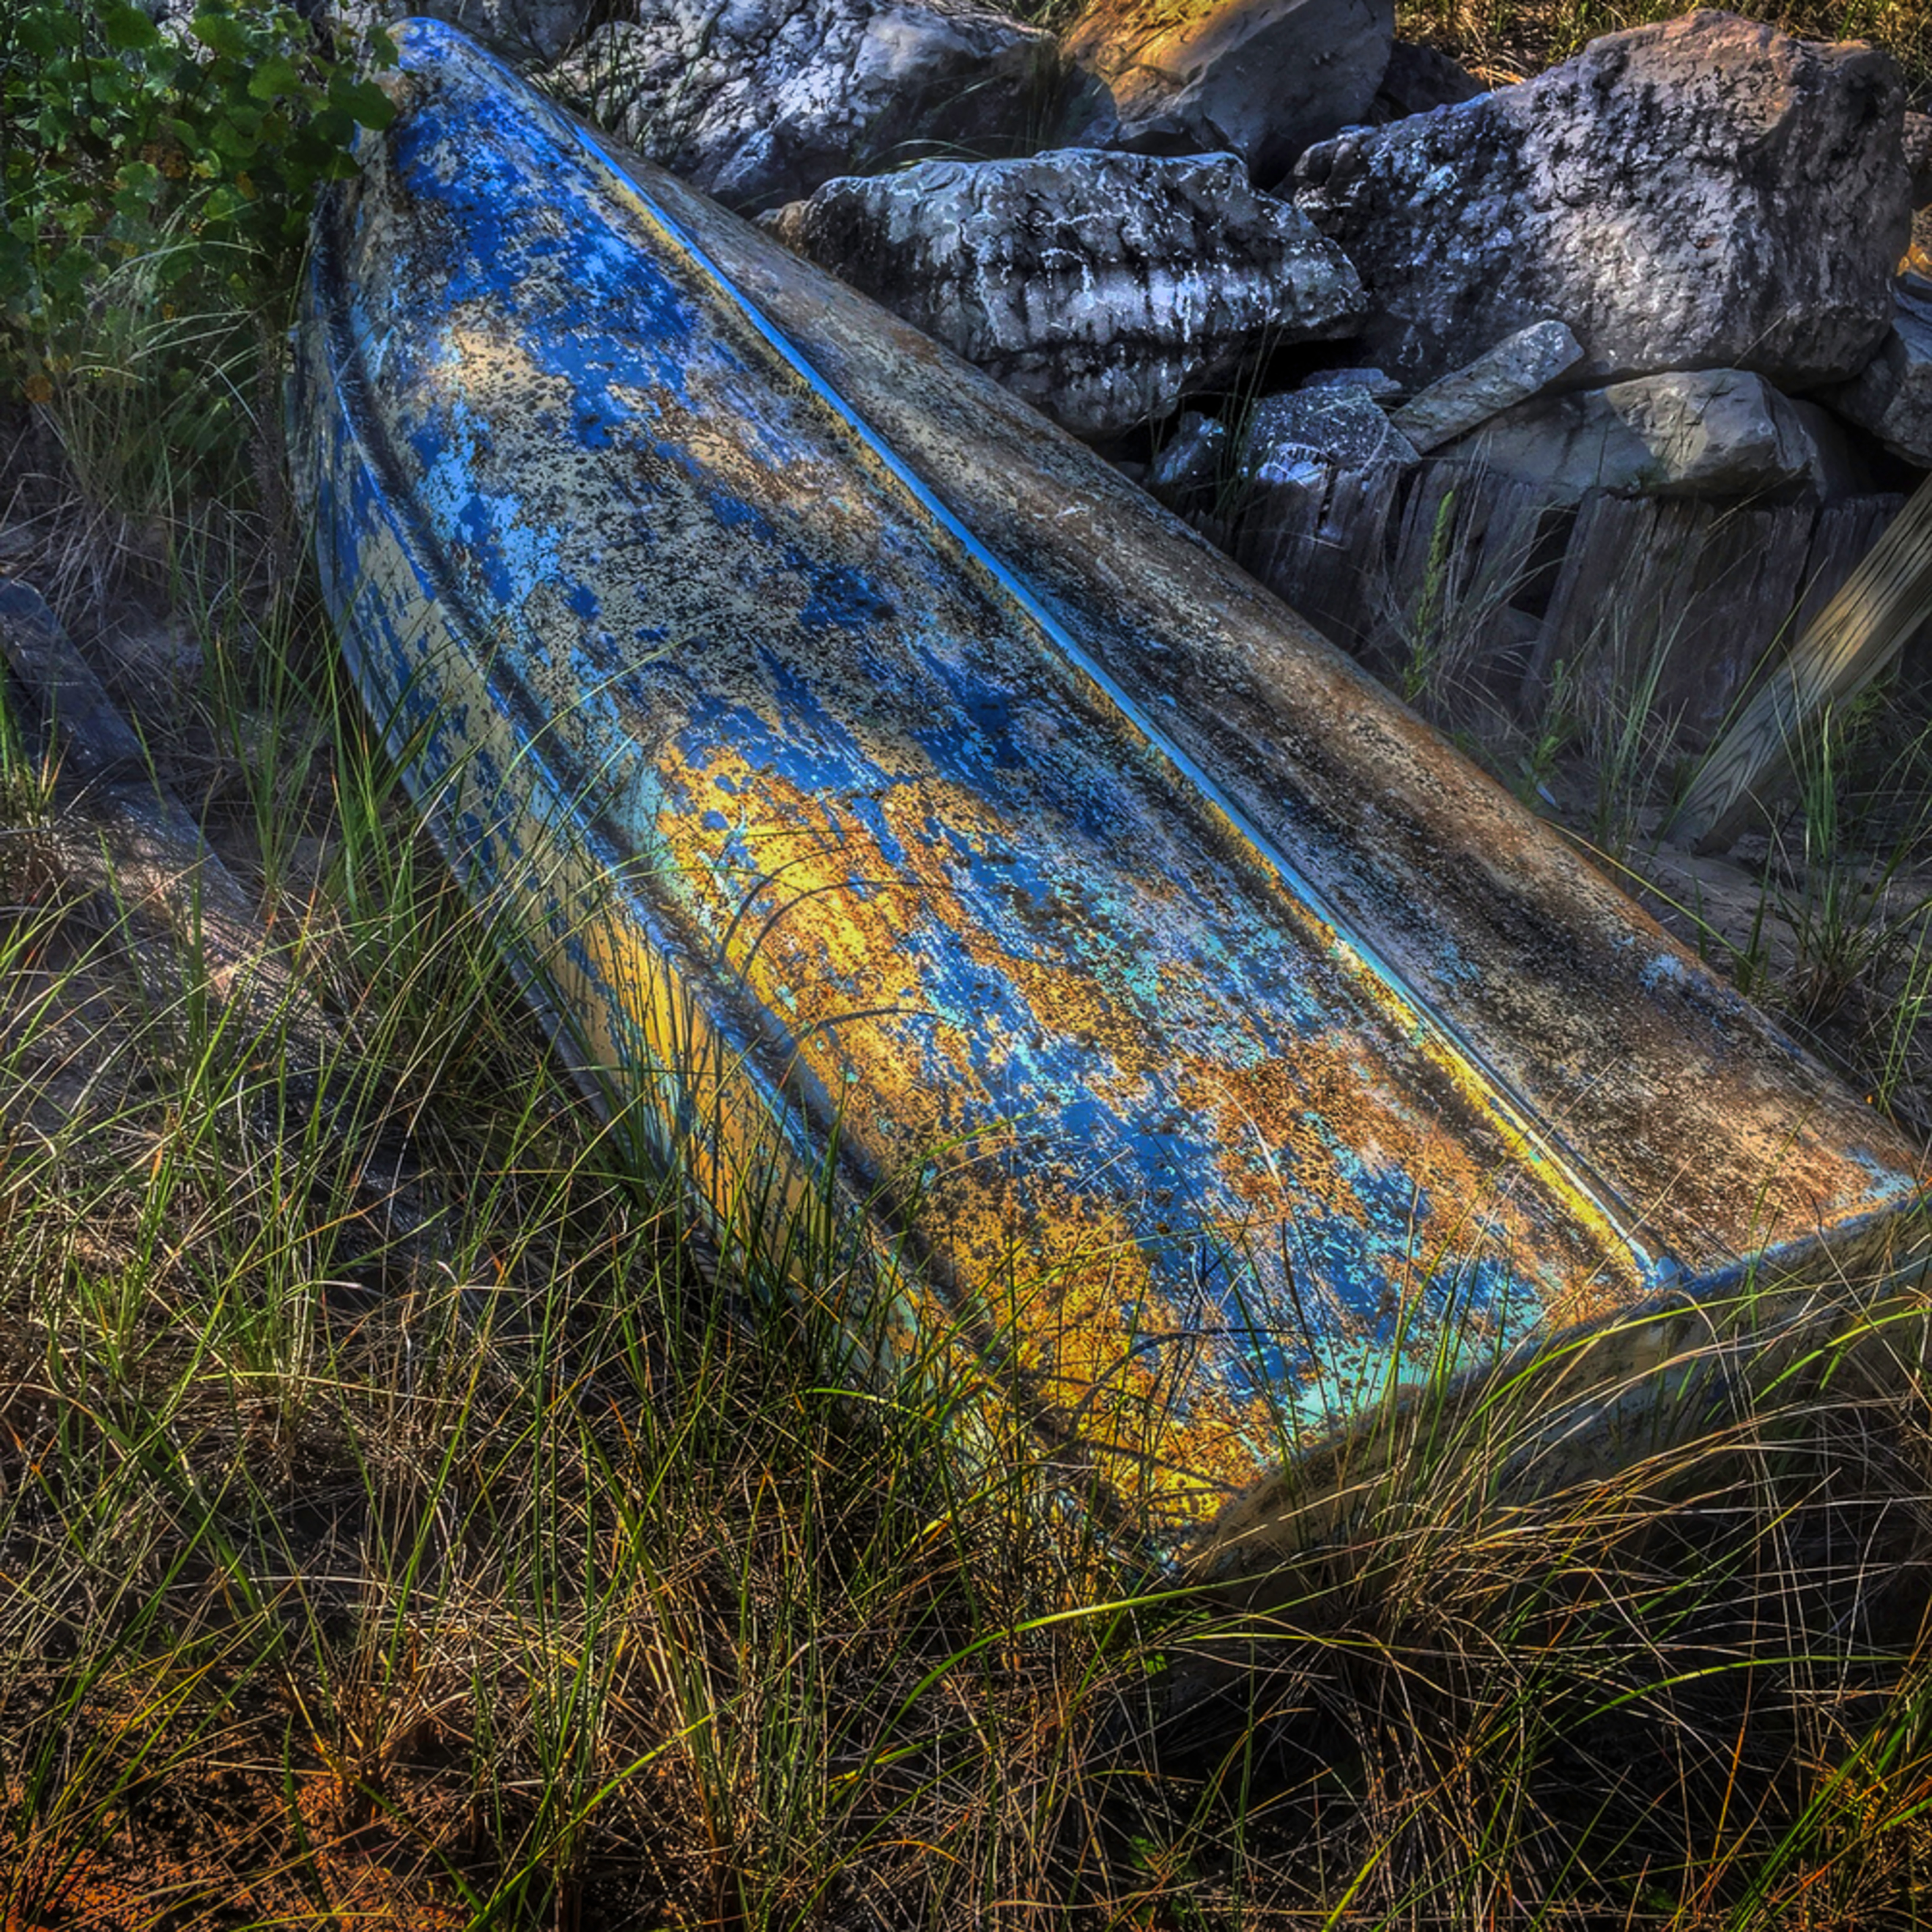 Rough rowboat mas2019 da4cpy